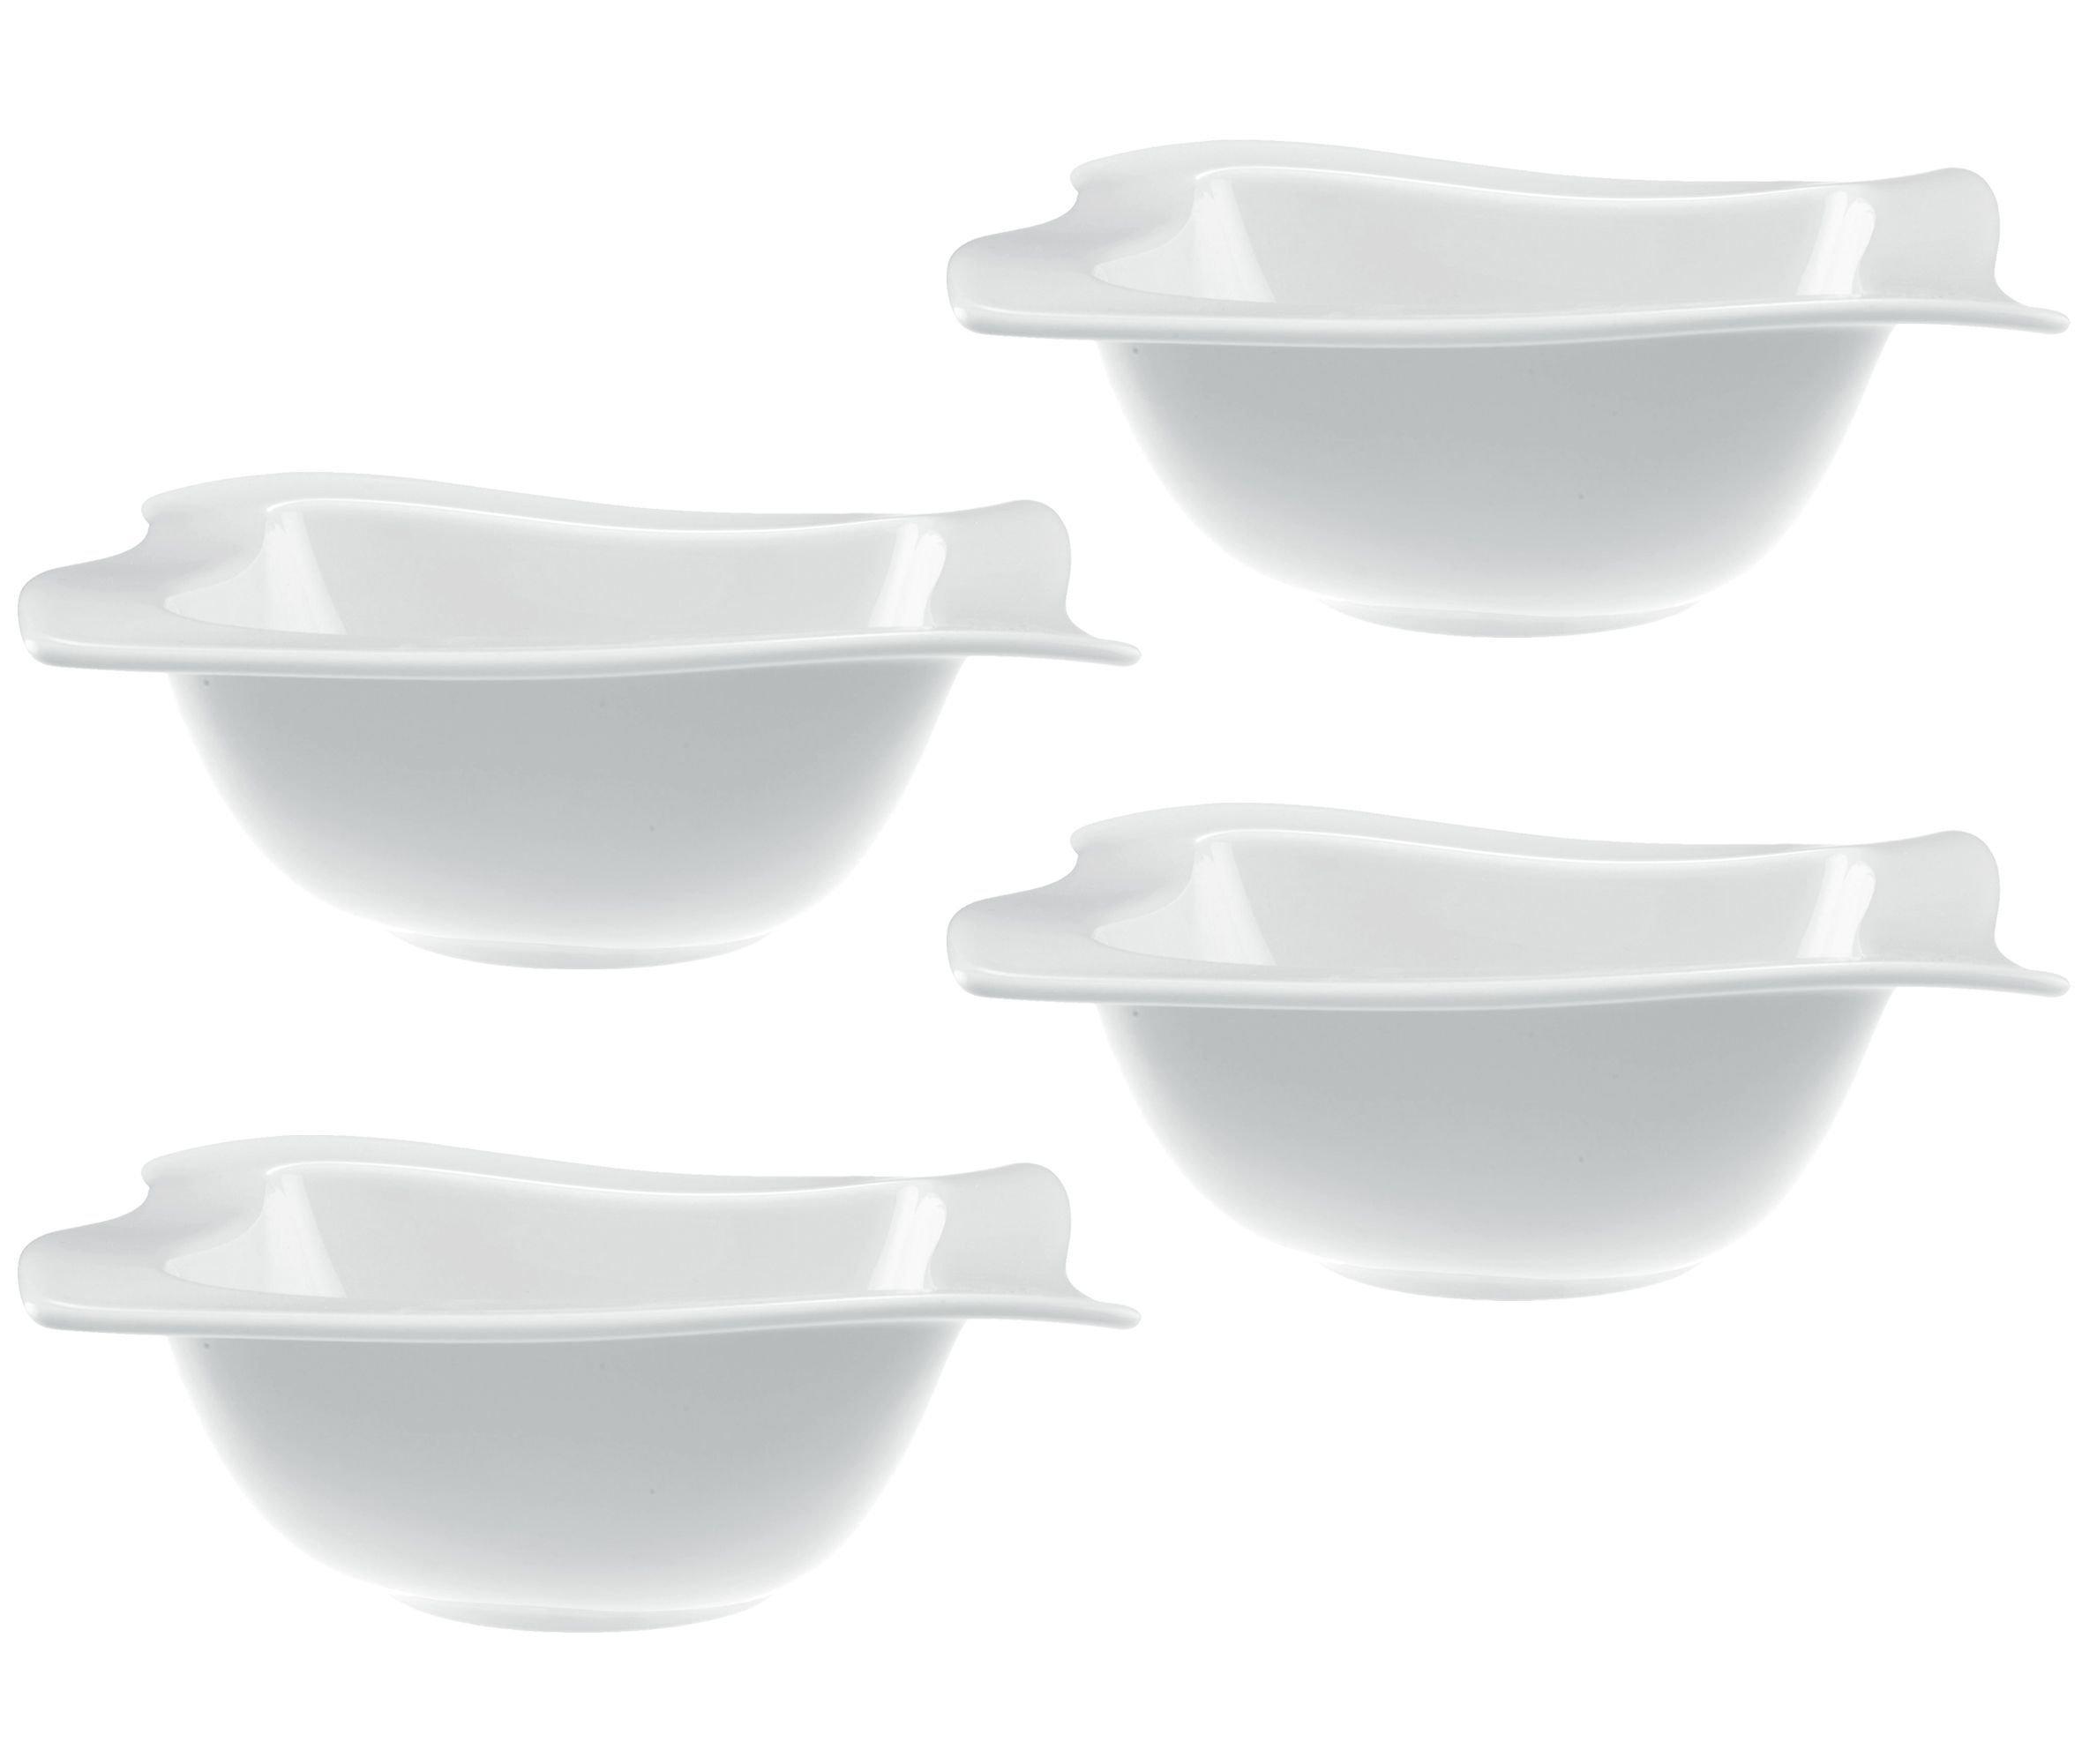 New Wave Bowl Set of 4 by Villeroy & Boch - 20 Ounces by Villeroy & Boch (Image #2)